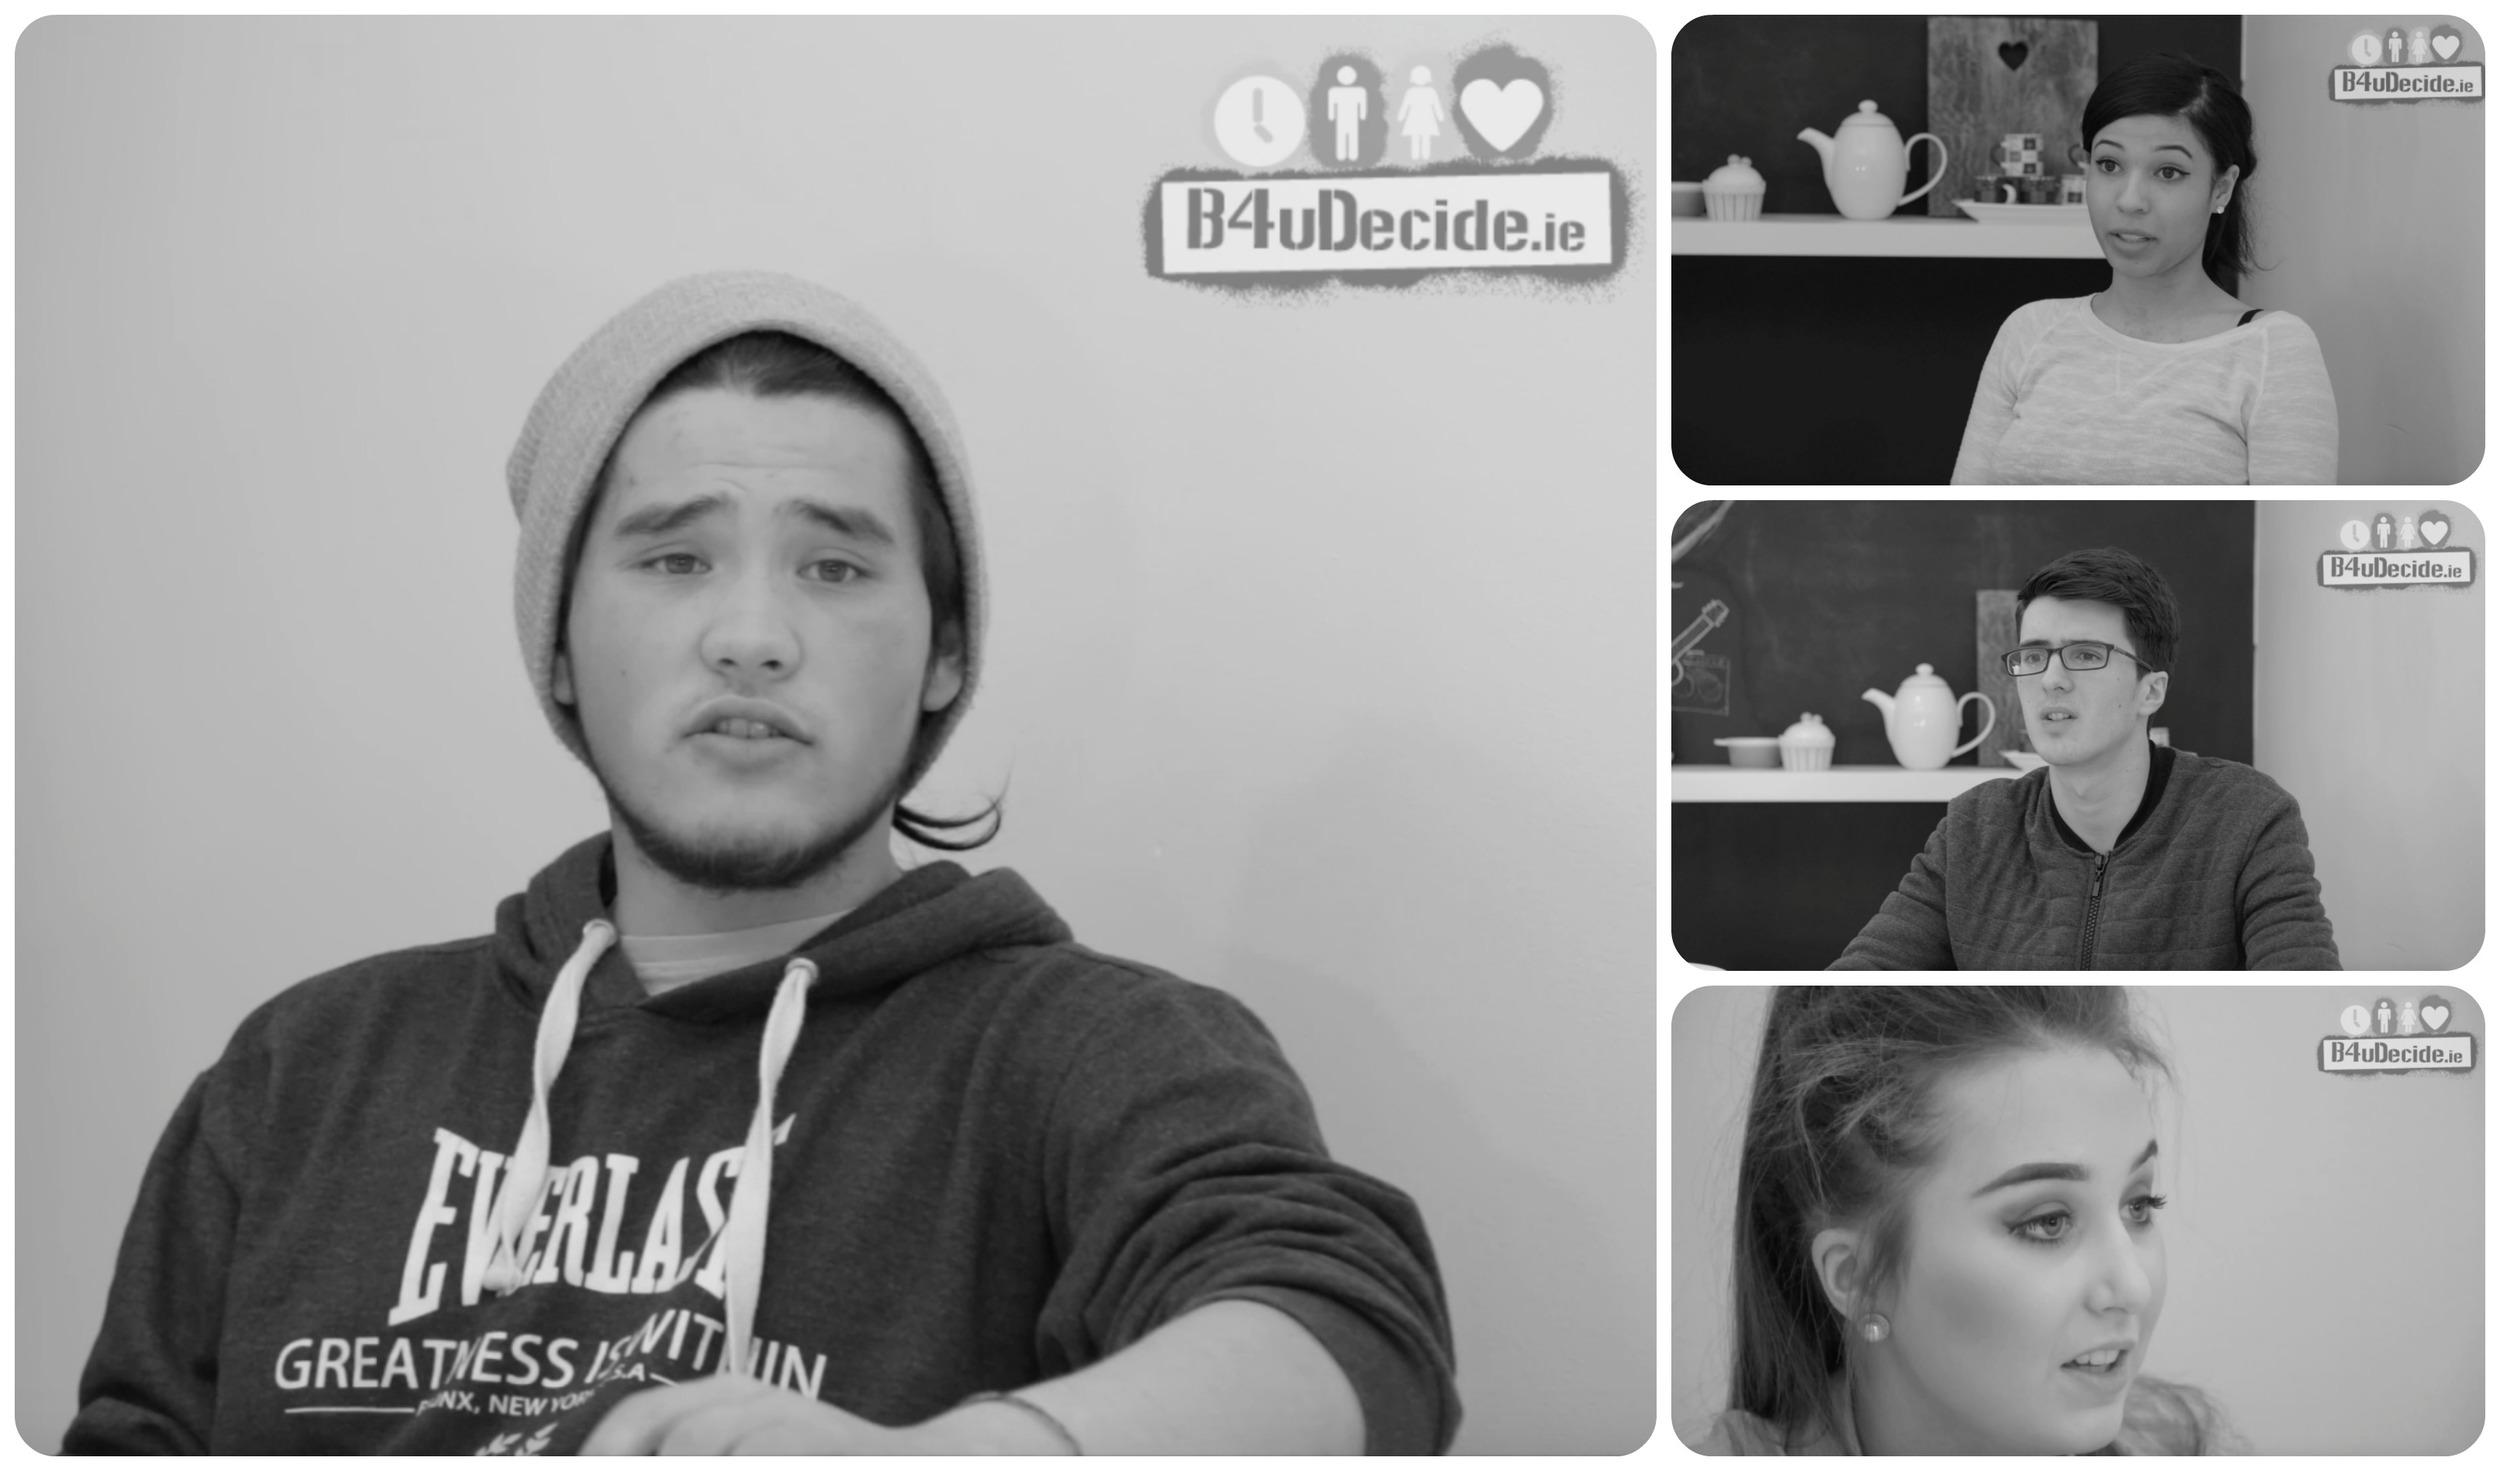 B4Udecide Collage 1.jpg